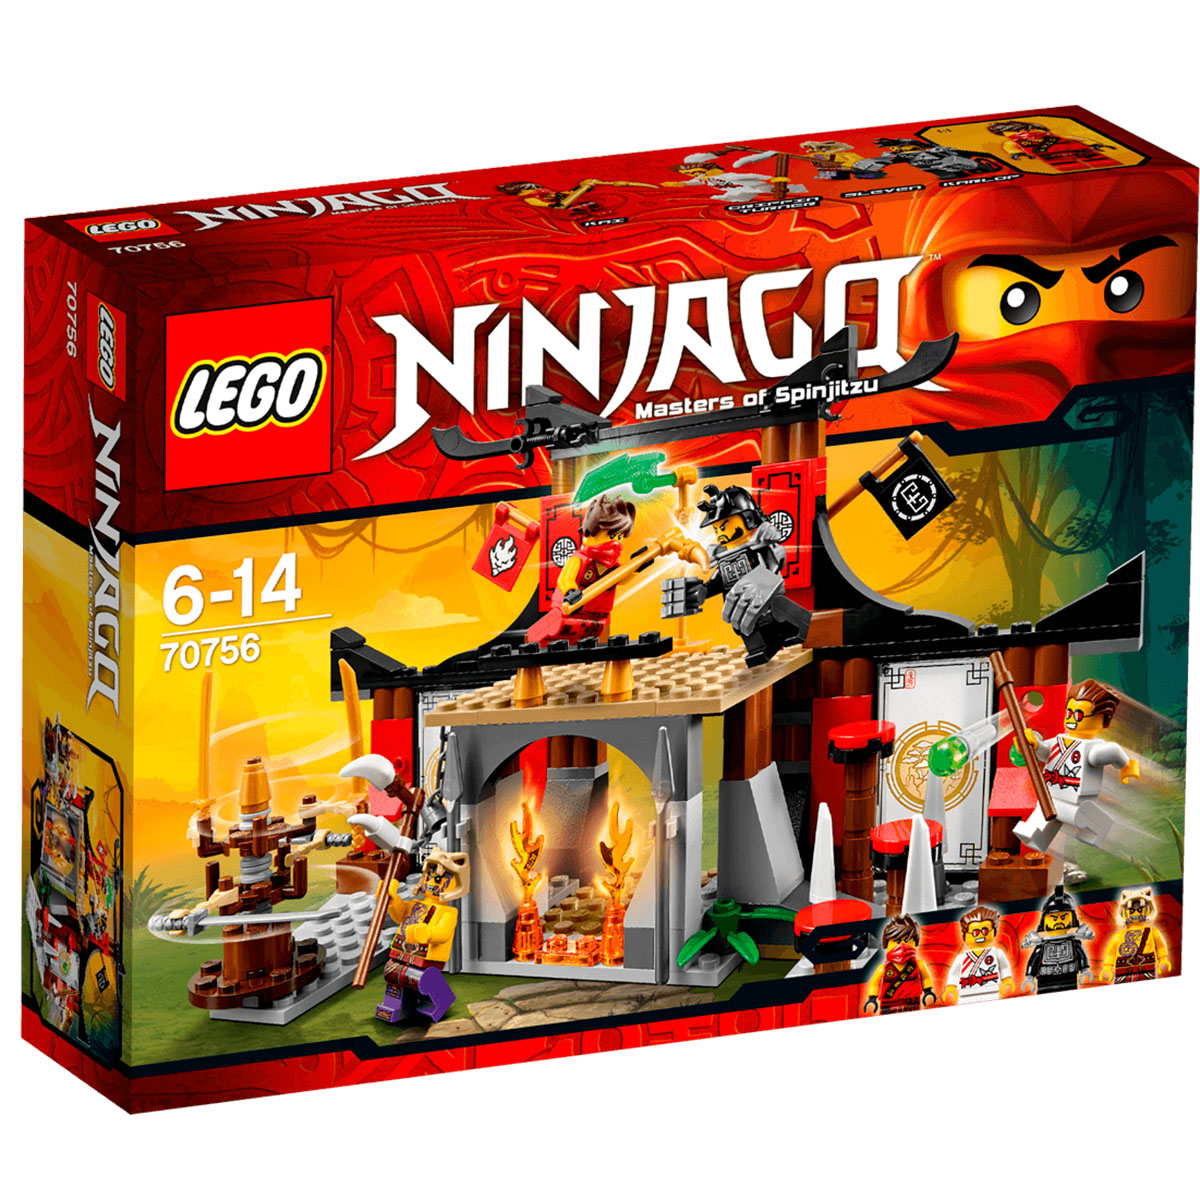 Mo hinh LEGO Ninjago – Vo duong Ninja